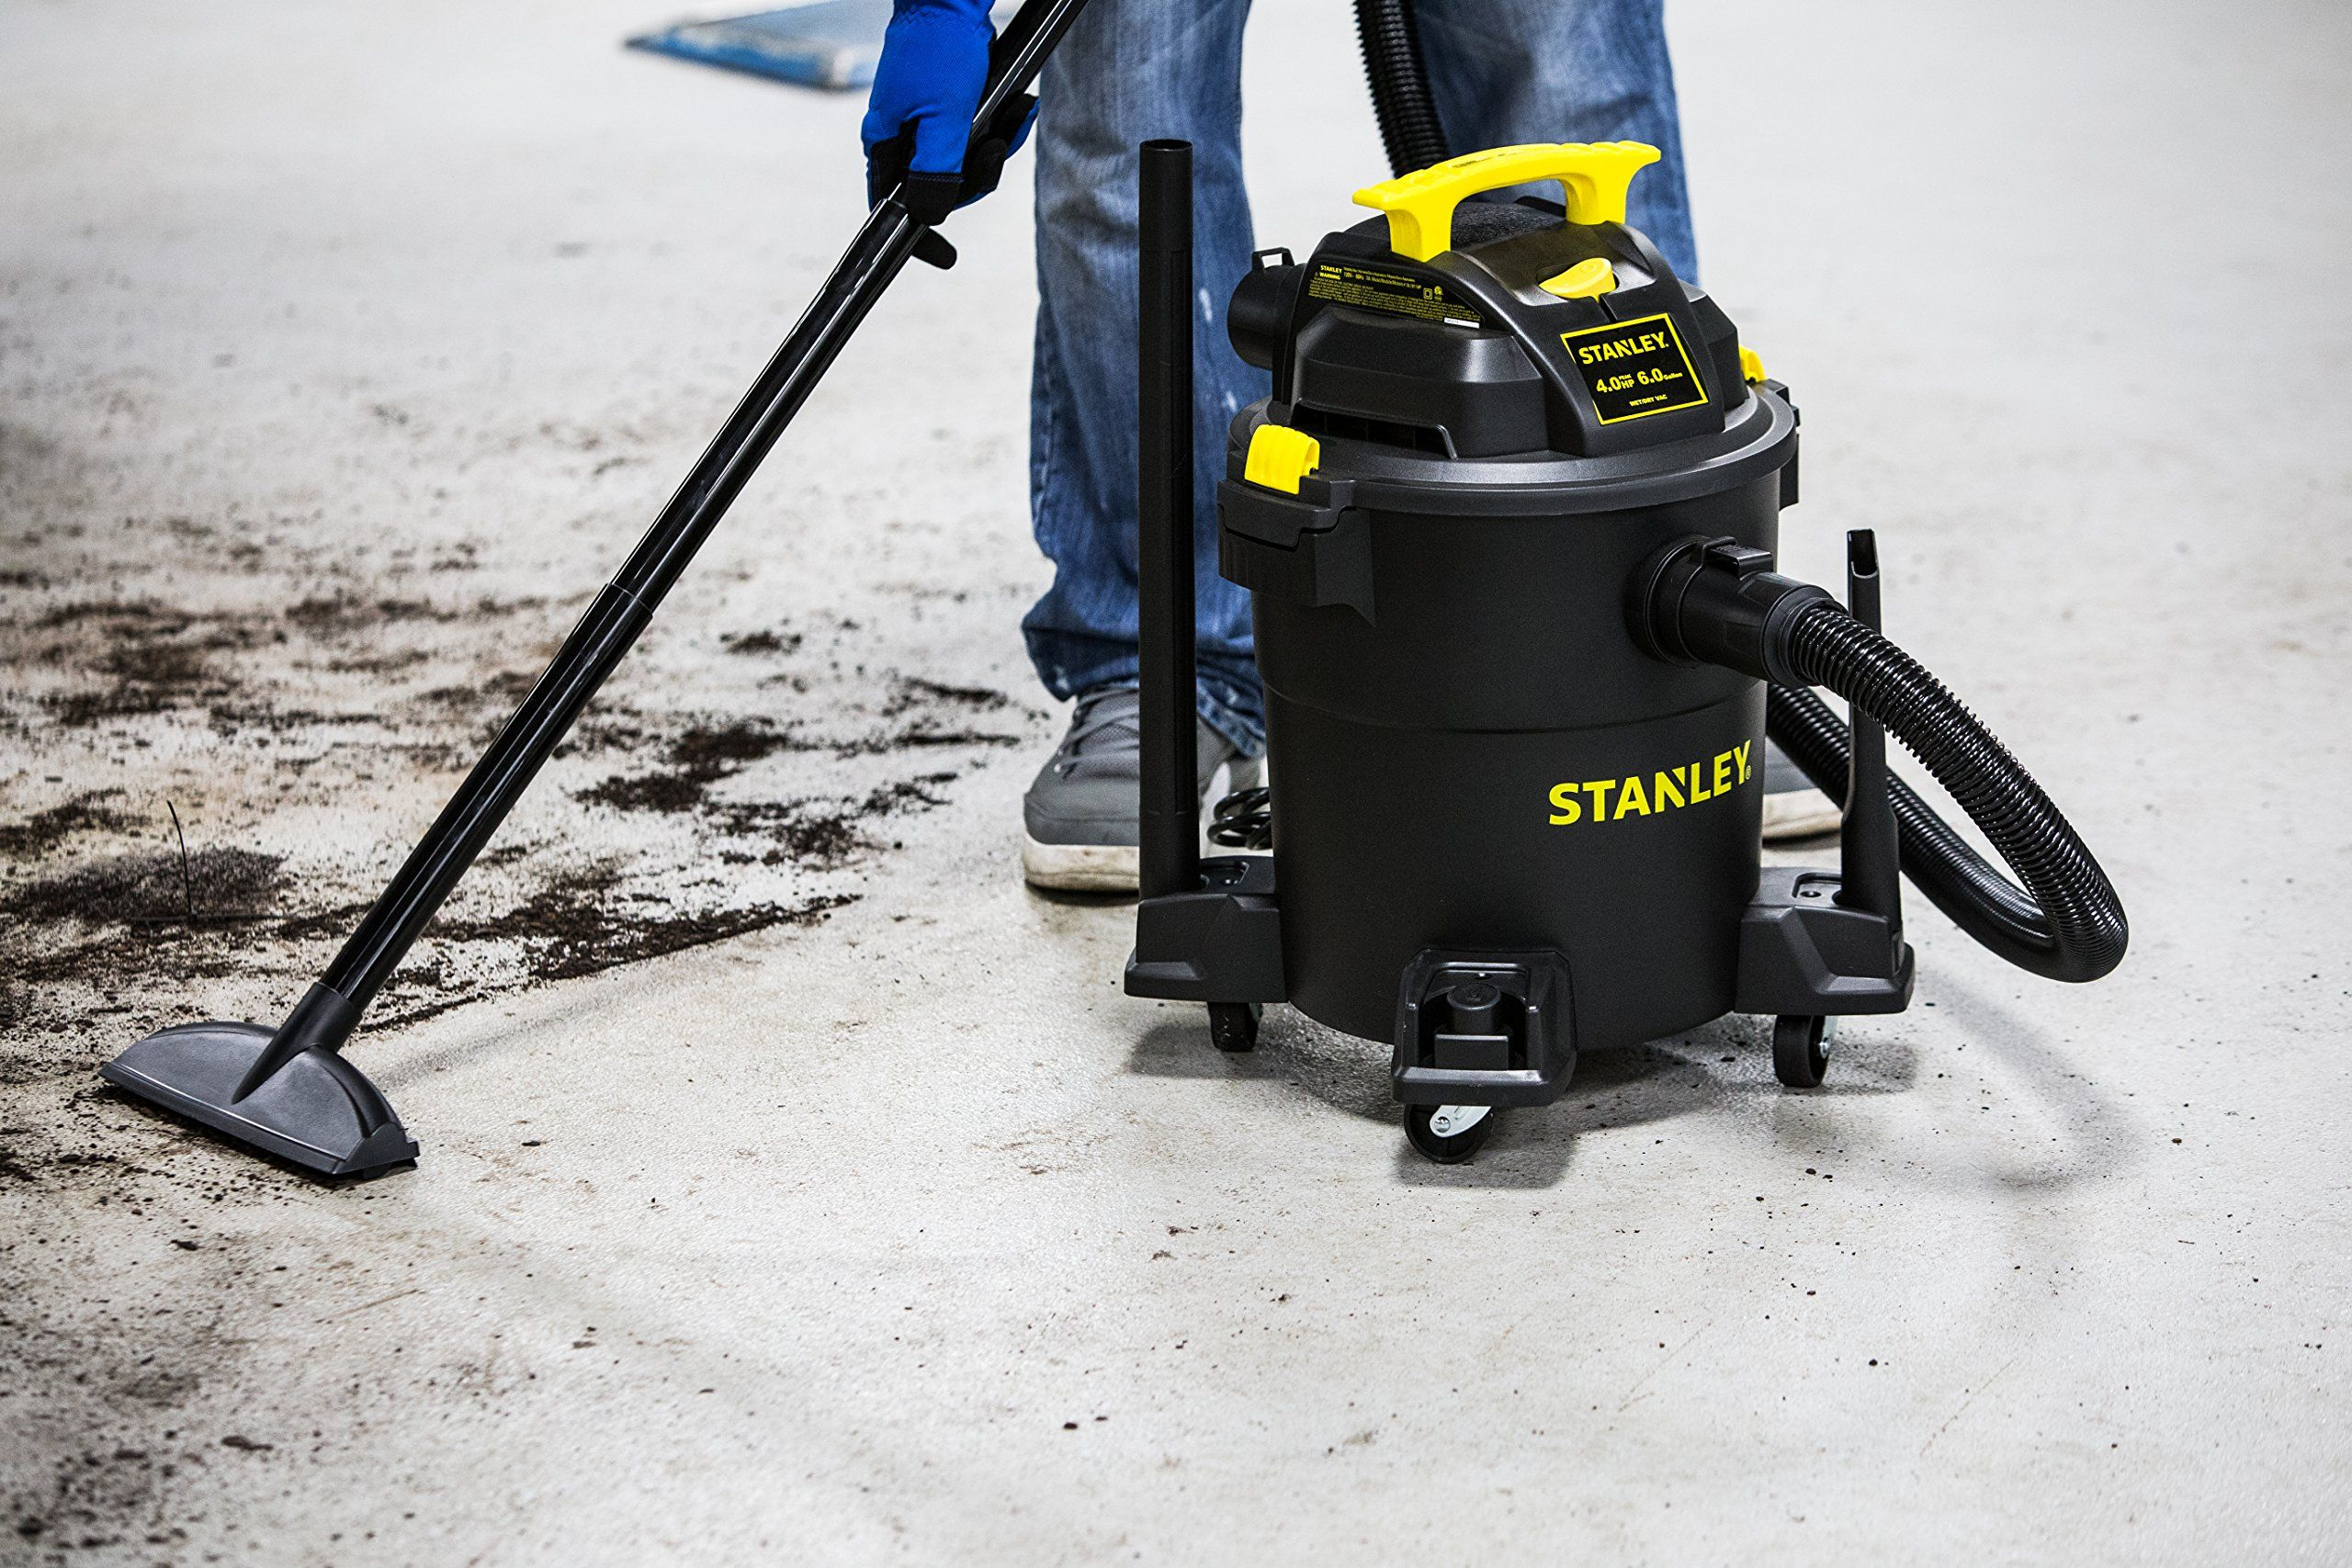 Stanley Wet Dry Vacuum 6 Gallon 4 Horsepower Ad Dry Ad Wet Stanley Horsepower Wet Dry Vacuum Shop Vacuum Vacuums